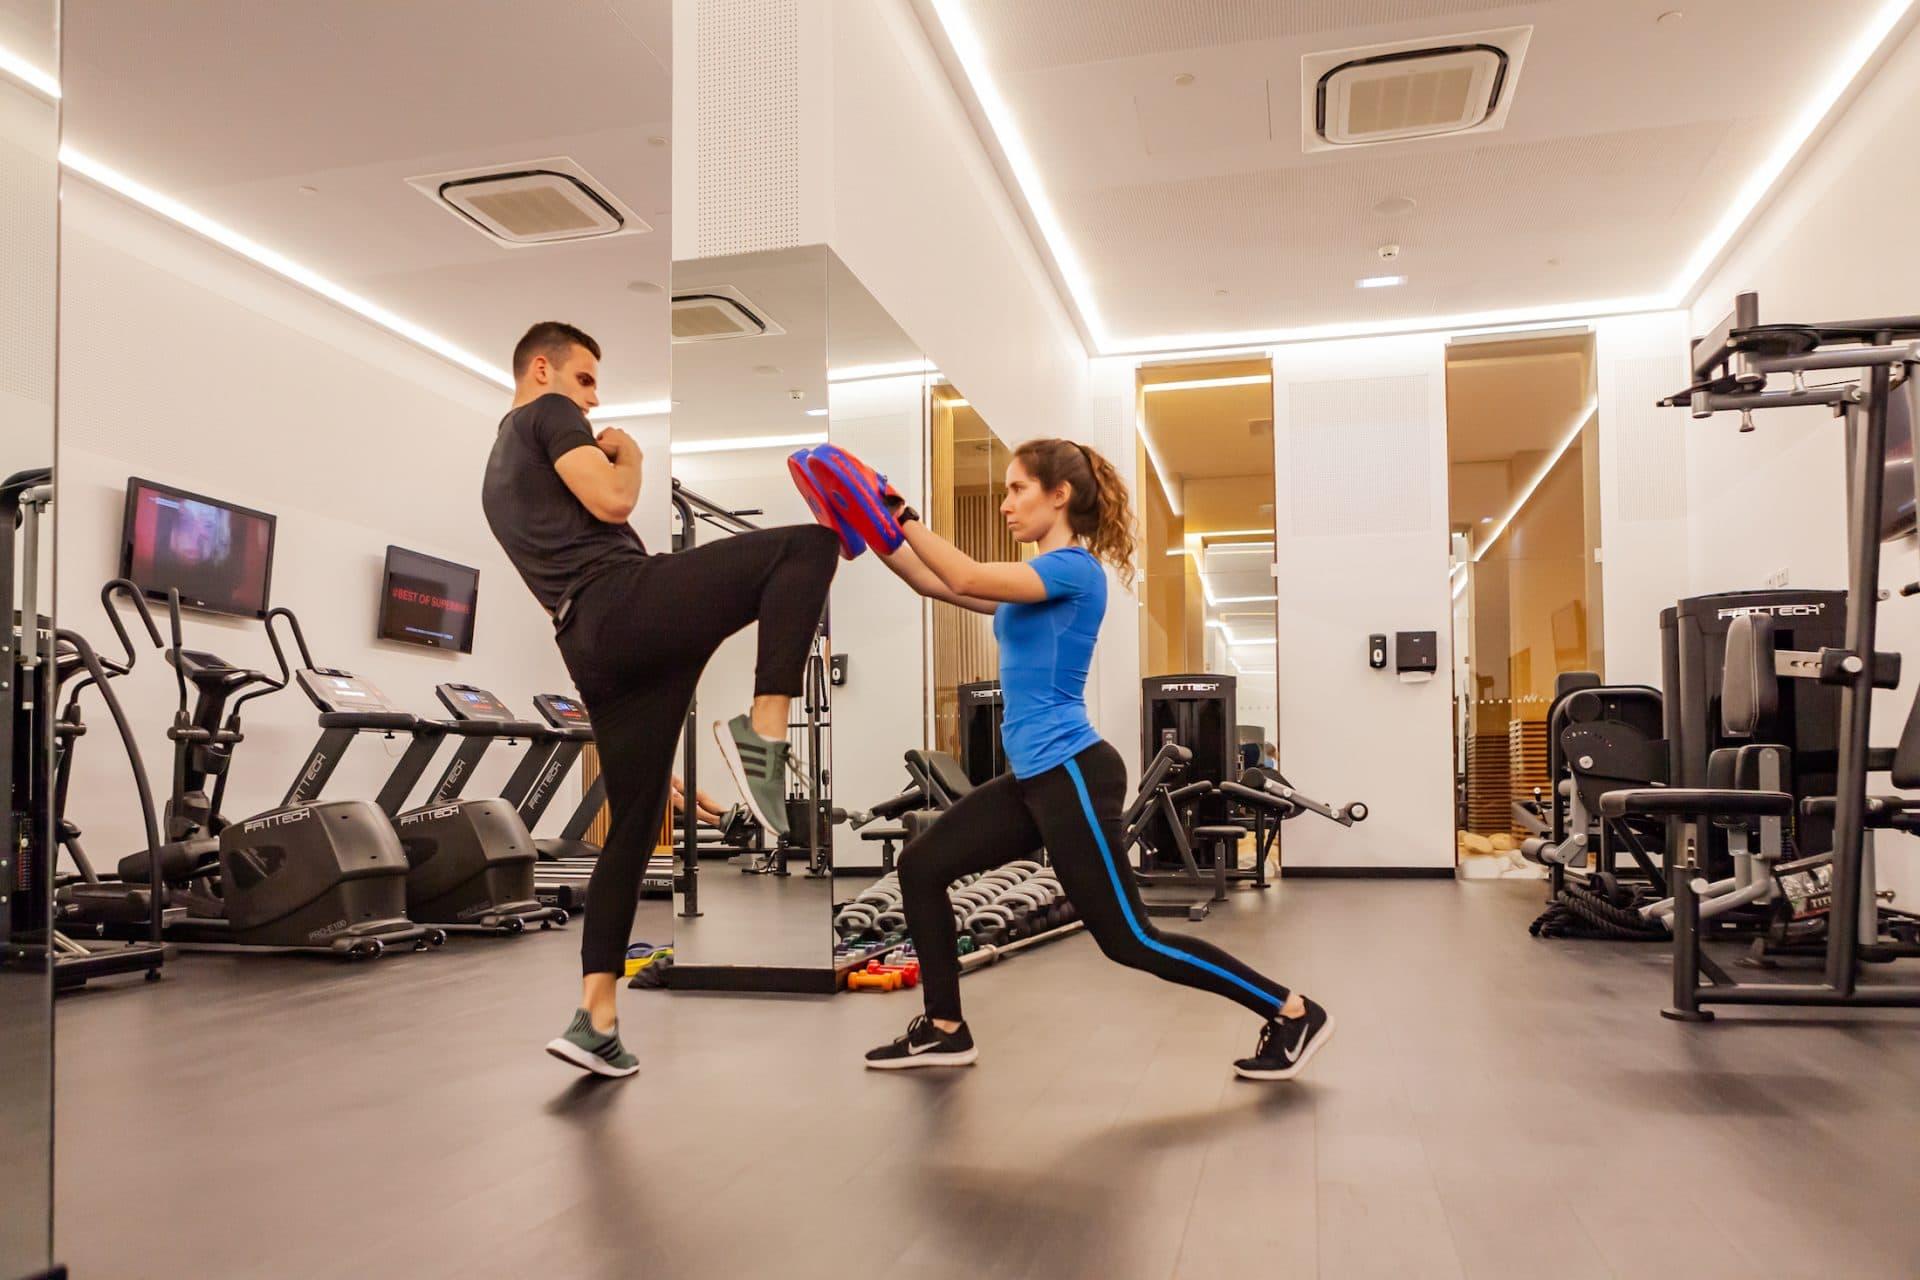 osmos-wellness-center-gym-vidamar-hotels-resorts-algarve-2